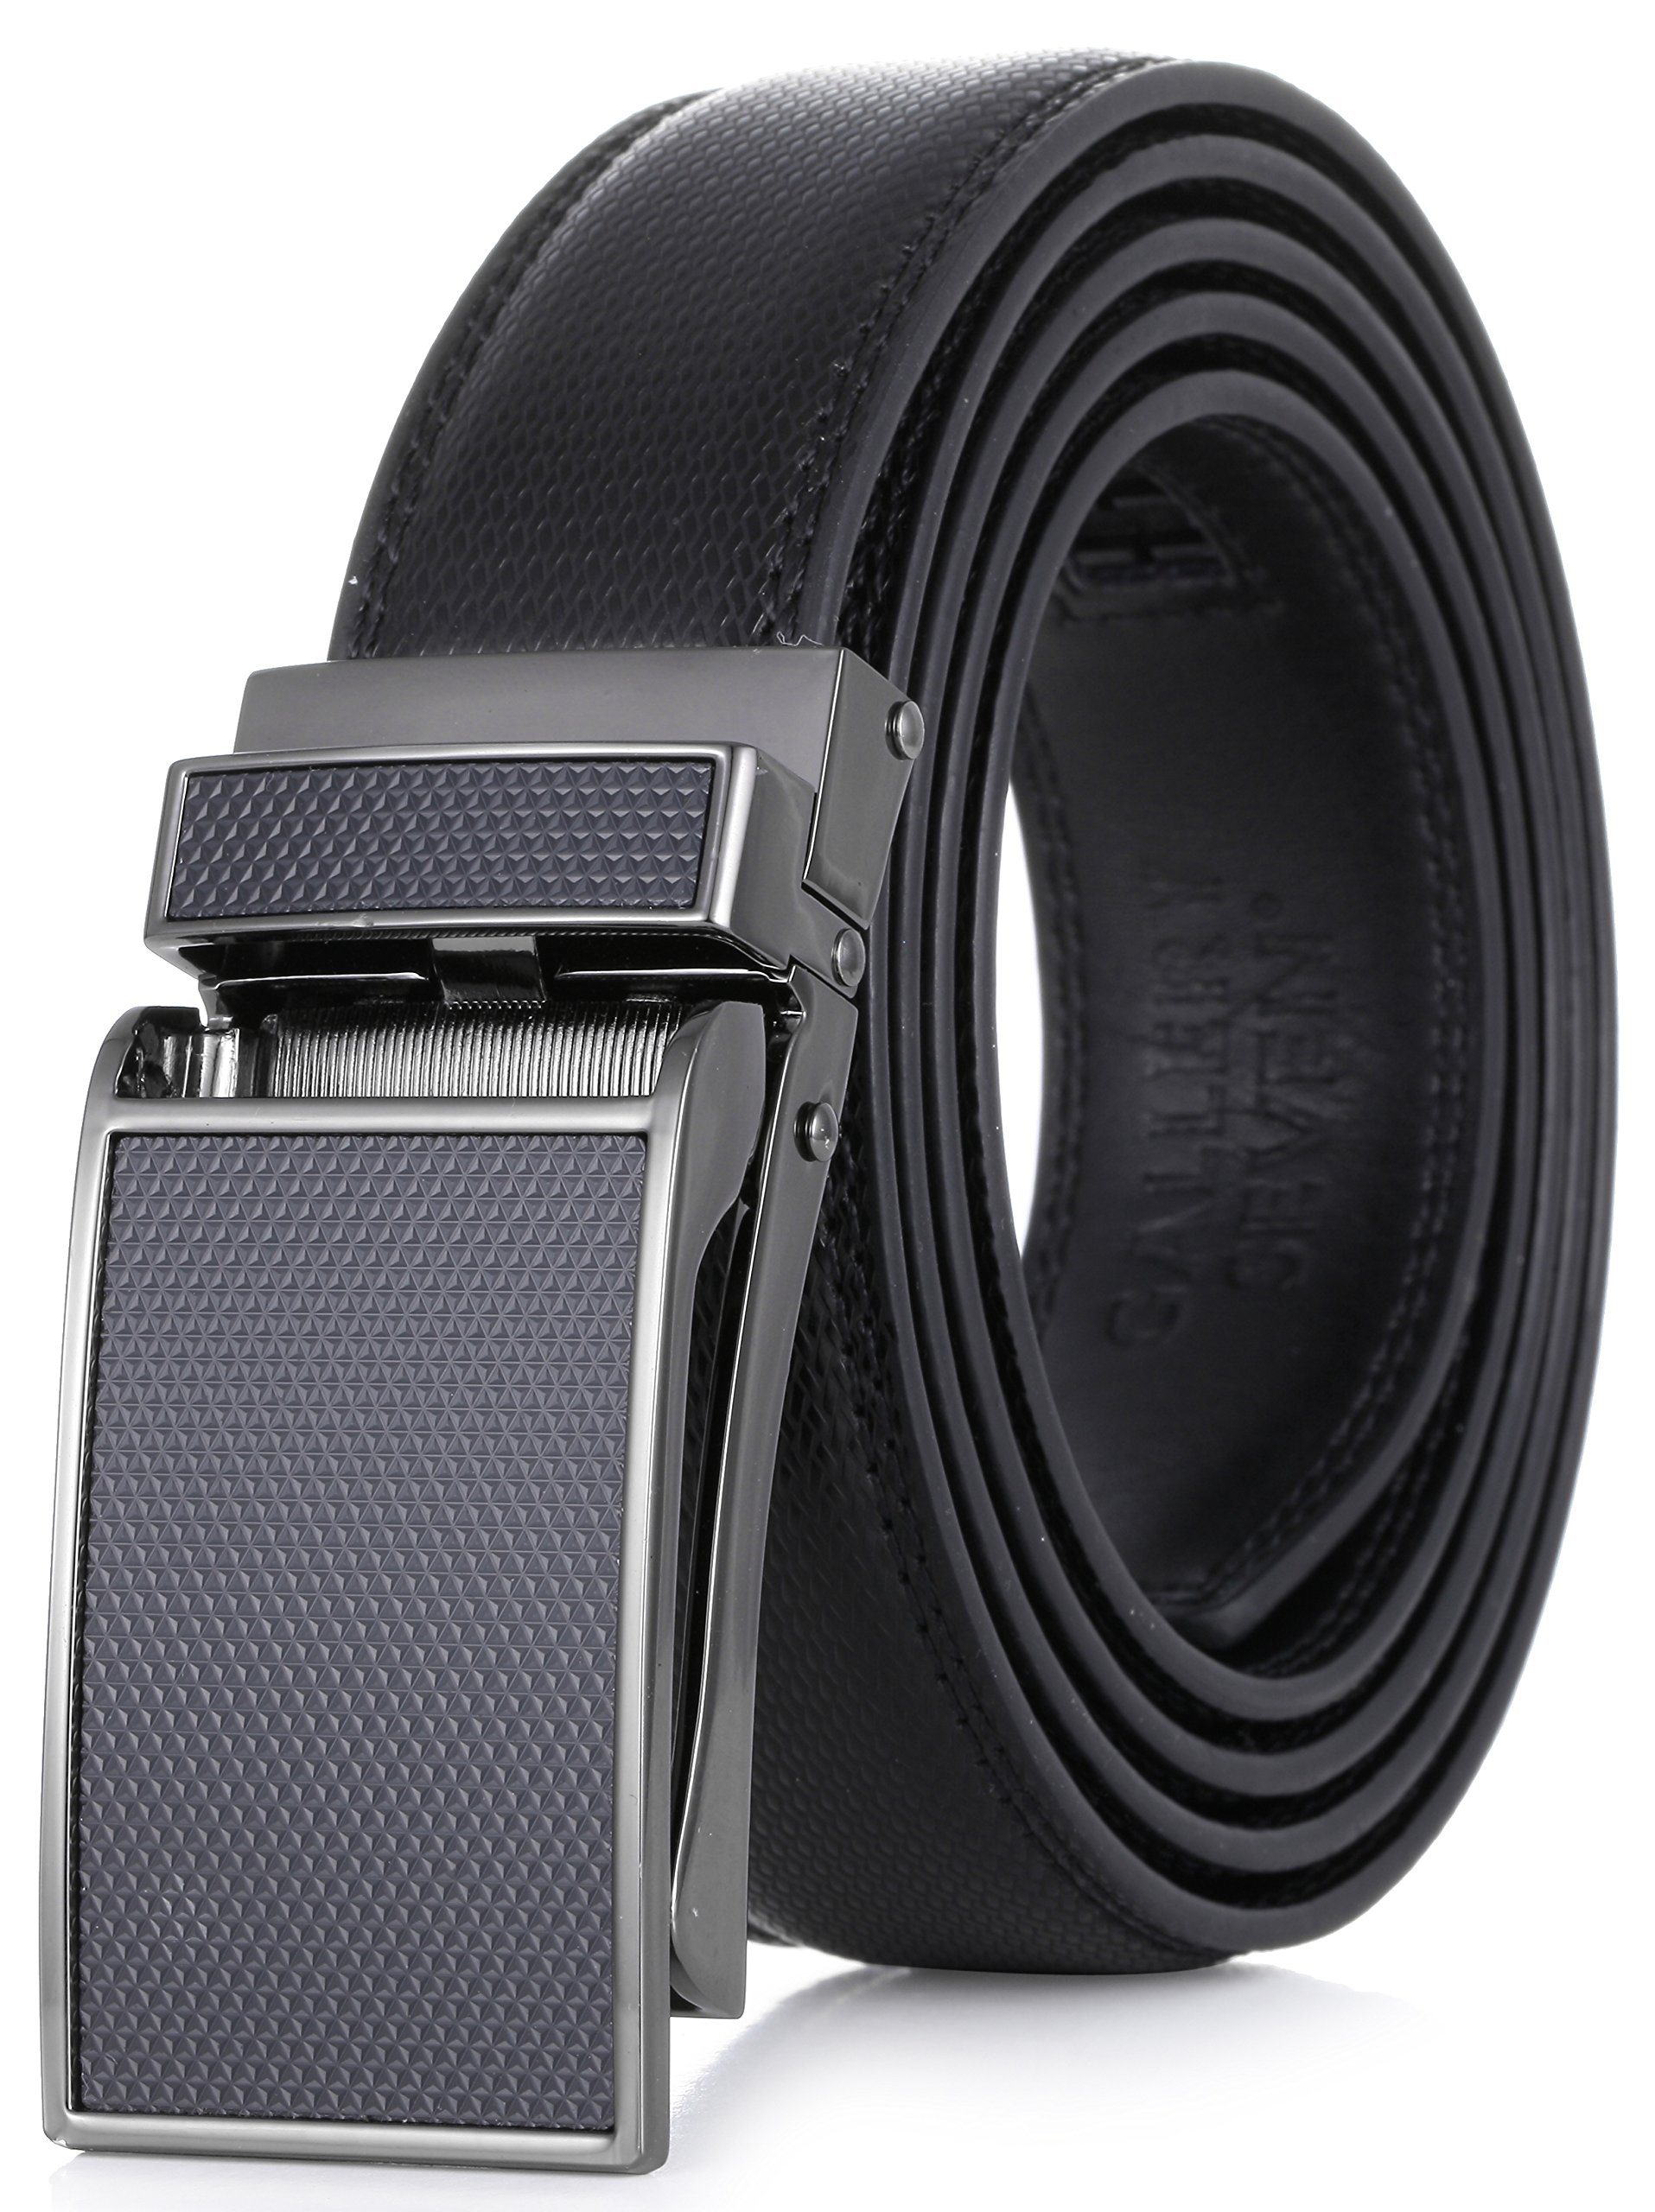 Gallery Seven Leather RatchetBelt For Men - Adjustable Click Belt - Casual Dress Belt - Black - Style 10 - Adjustable from 38'' to 54'' Waist